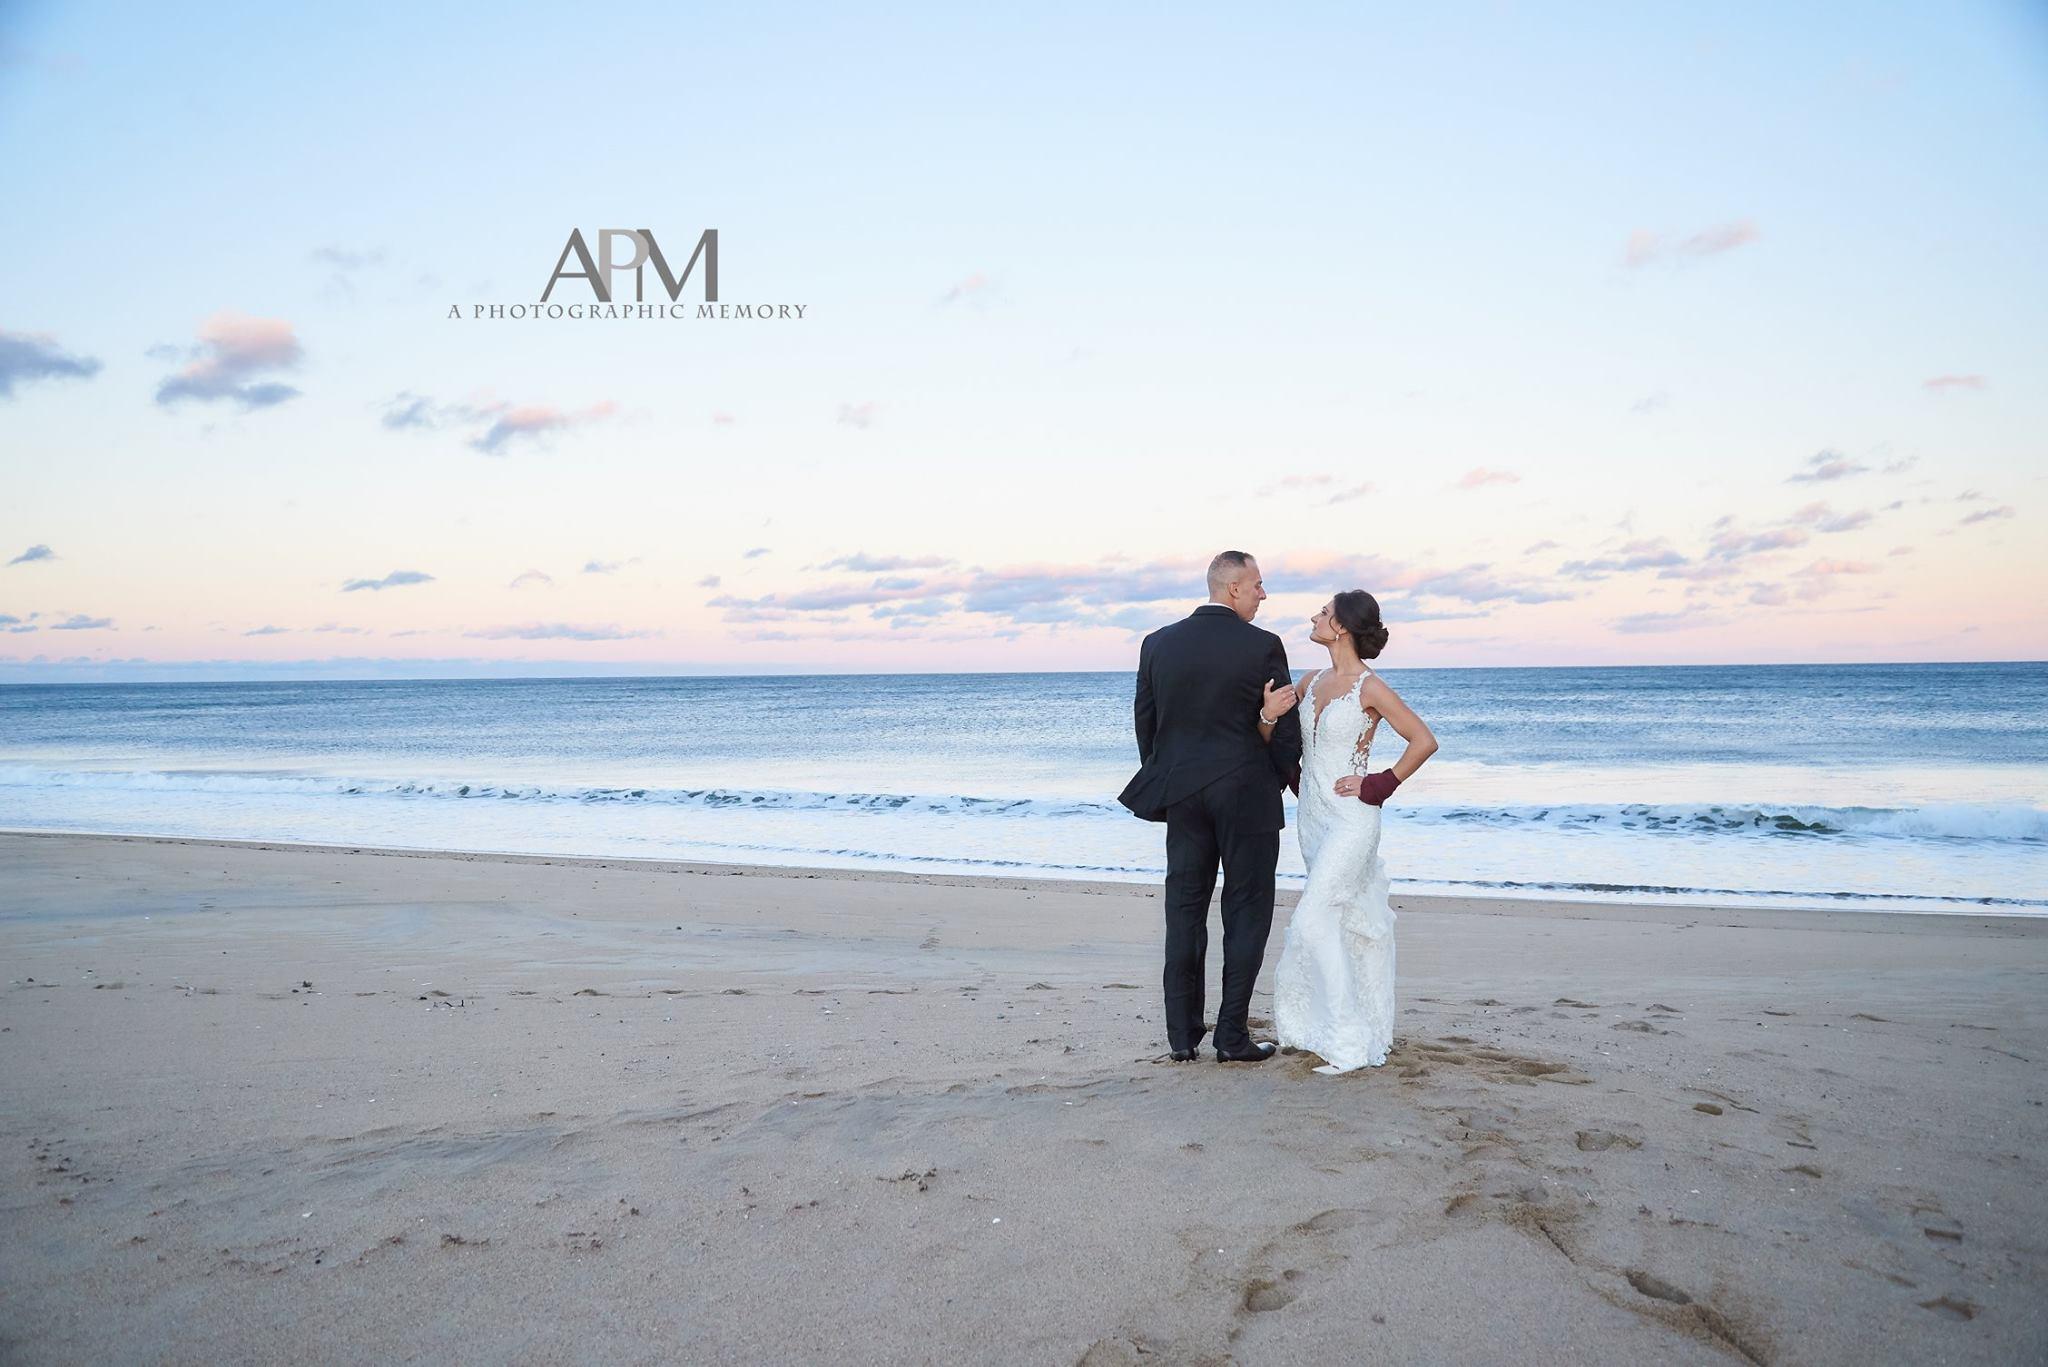 New England bridal shows